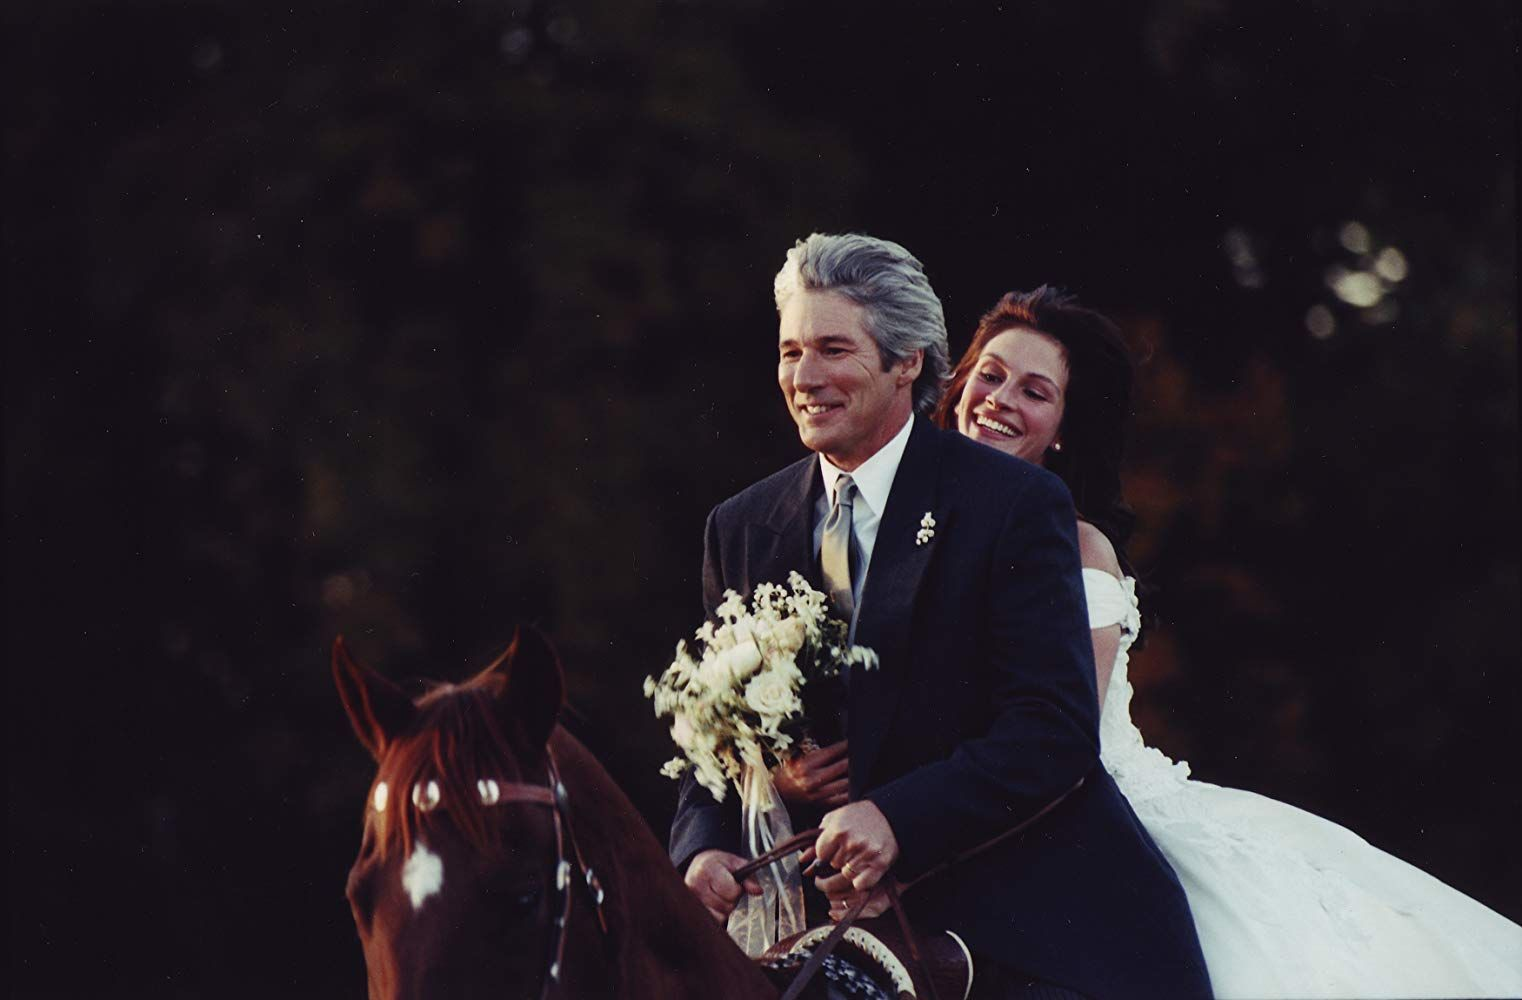 RUNAWAY BRIDE Richard Gere. Julia Roberts | Runaway bride. Richard gere. Classic movies